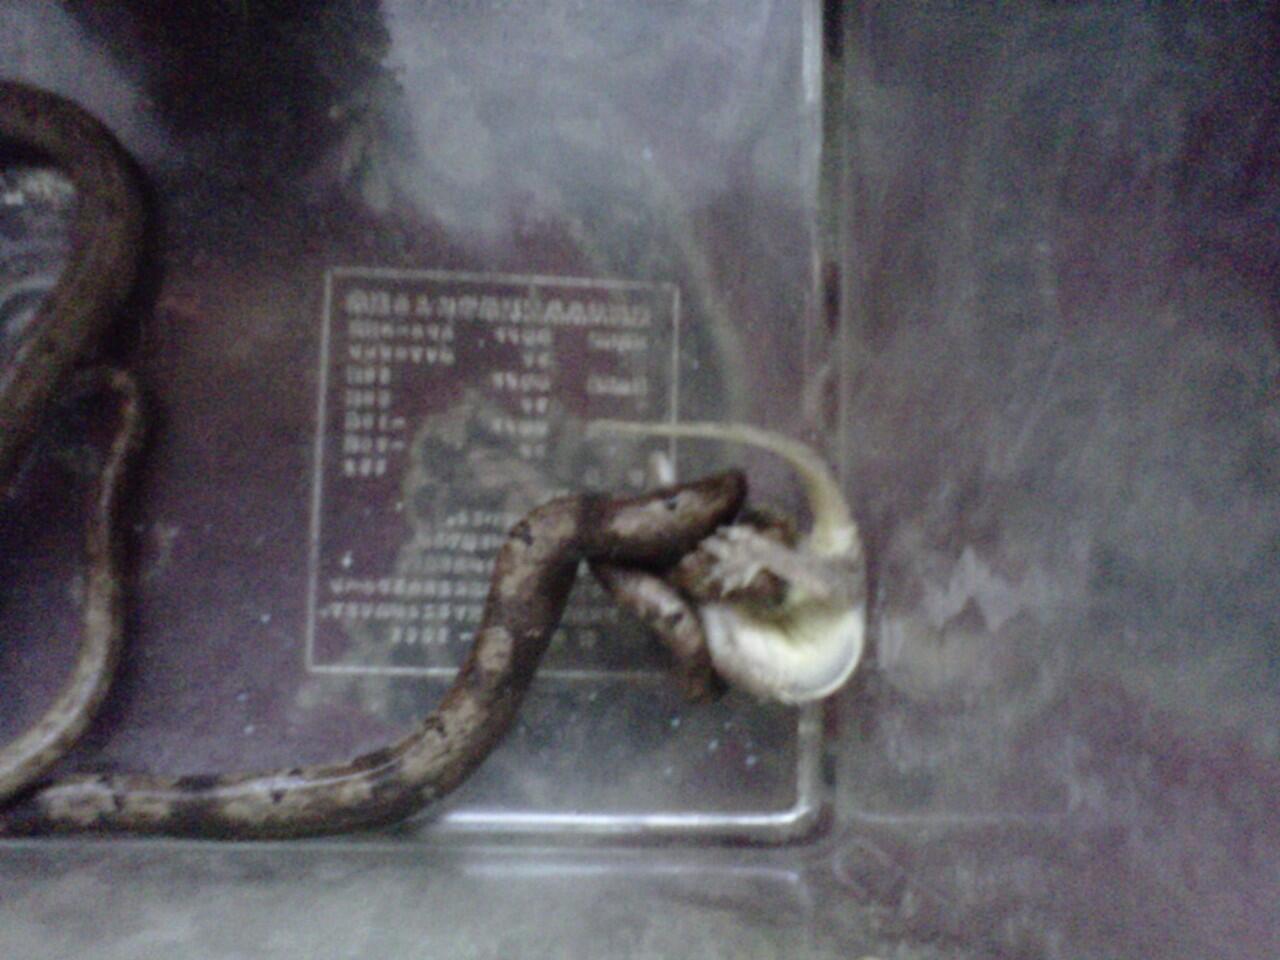 jual ular momo pohon